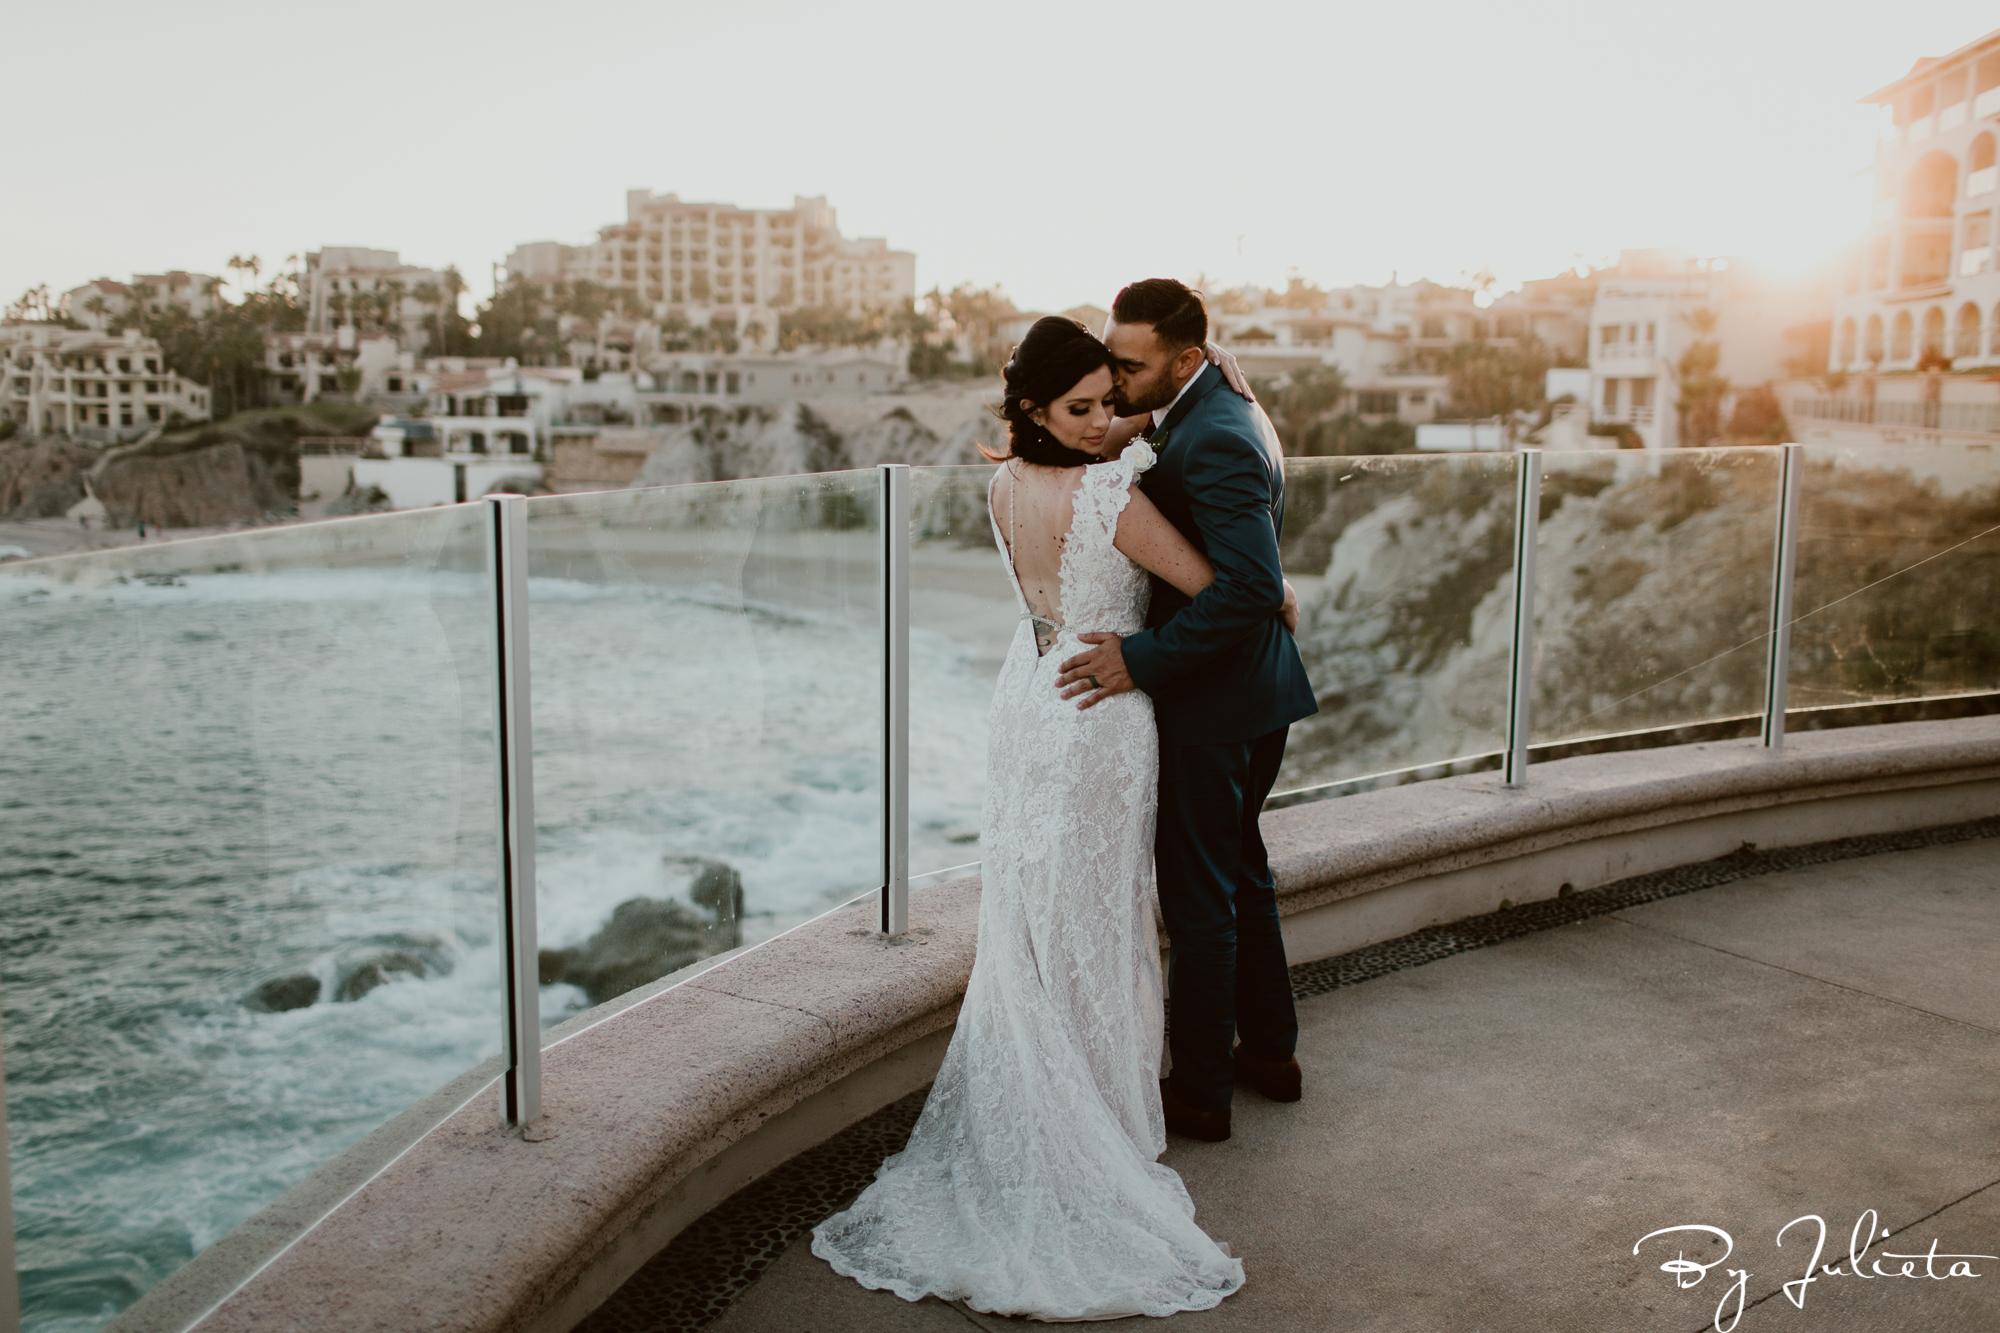 Welk Sirena Del Mar Cabo Wedding. J+J. Julieta Amezcua Photography-6.jpg